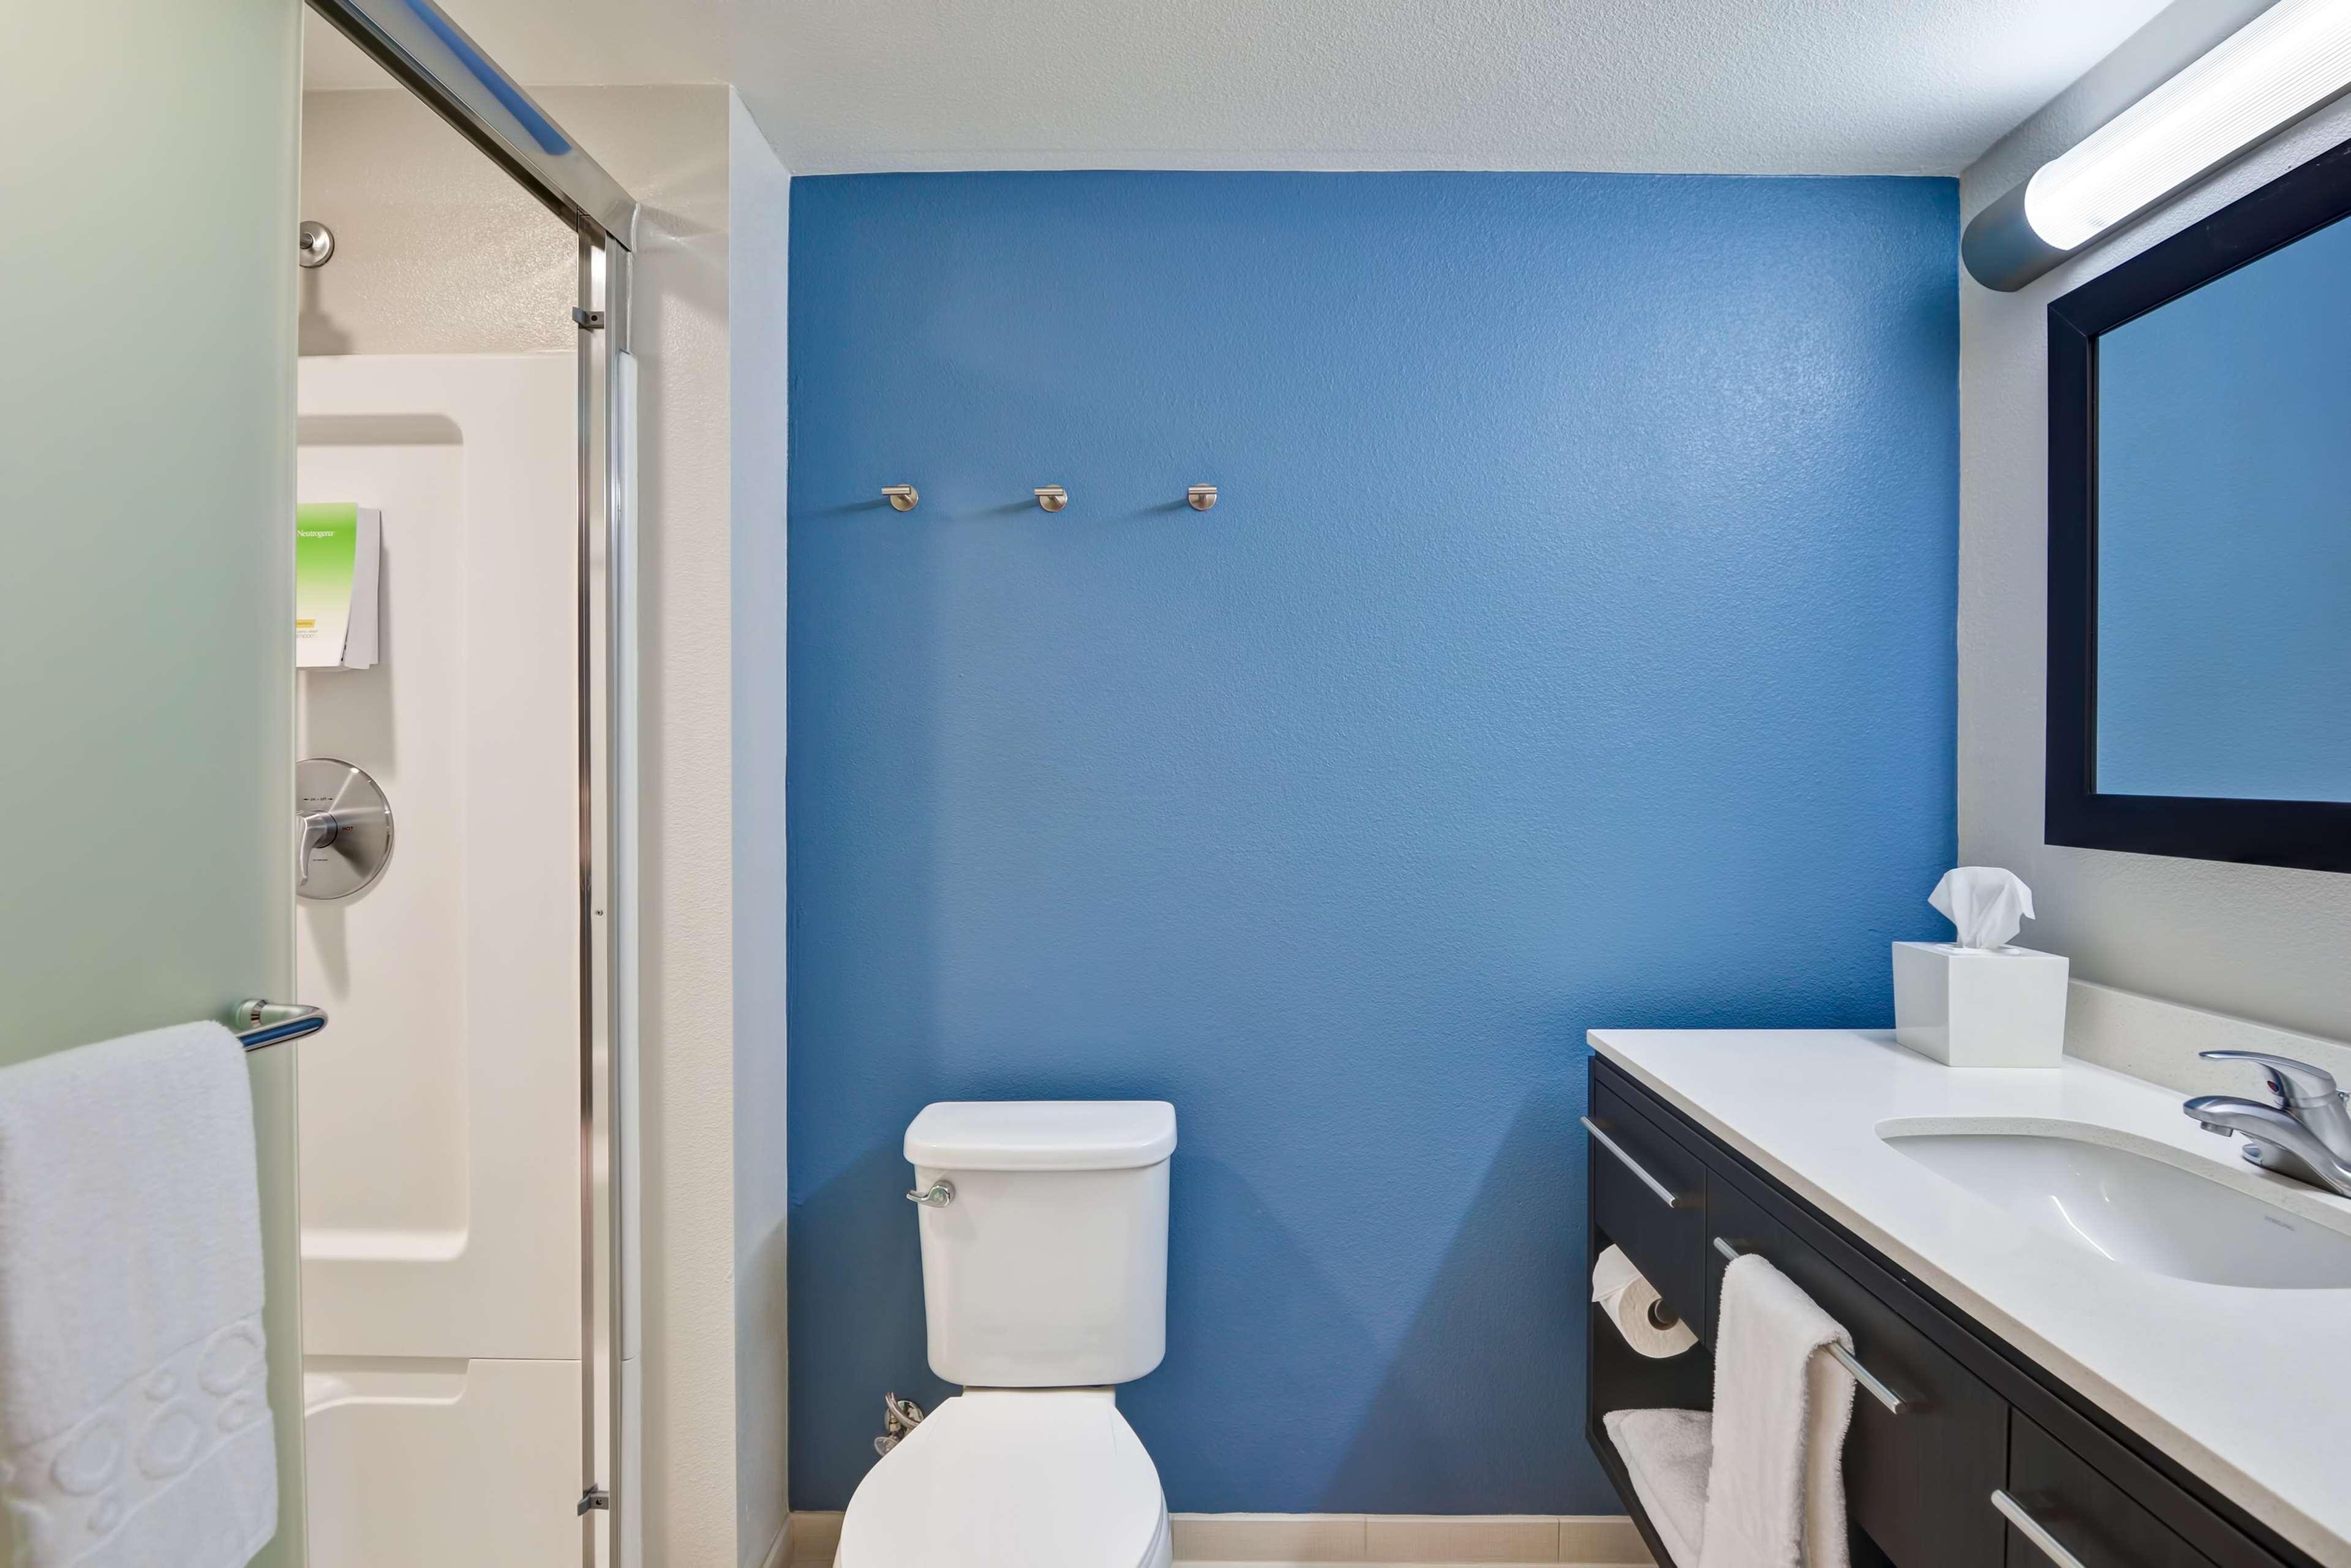 Home2 Suites by Hilton Azusa image 9